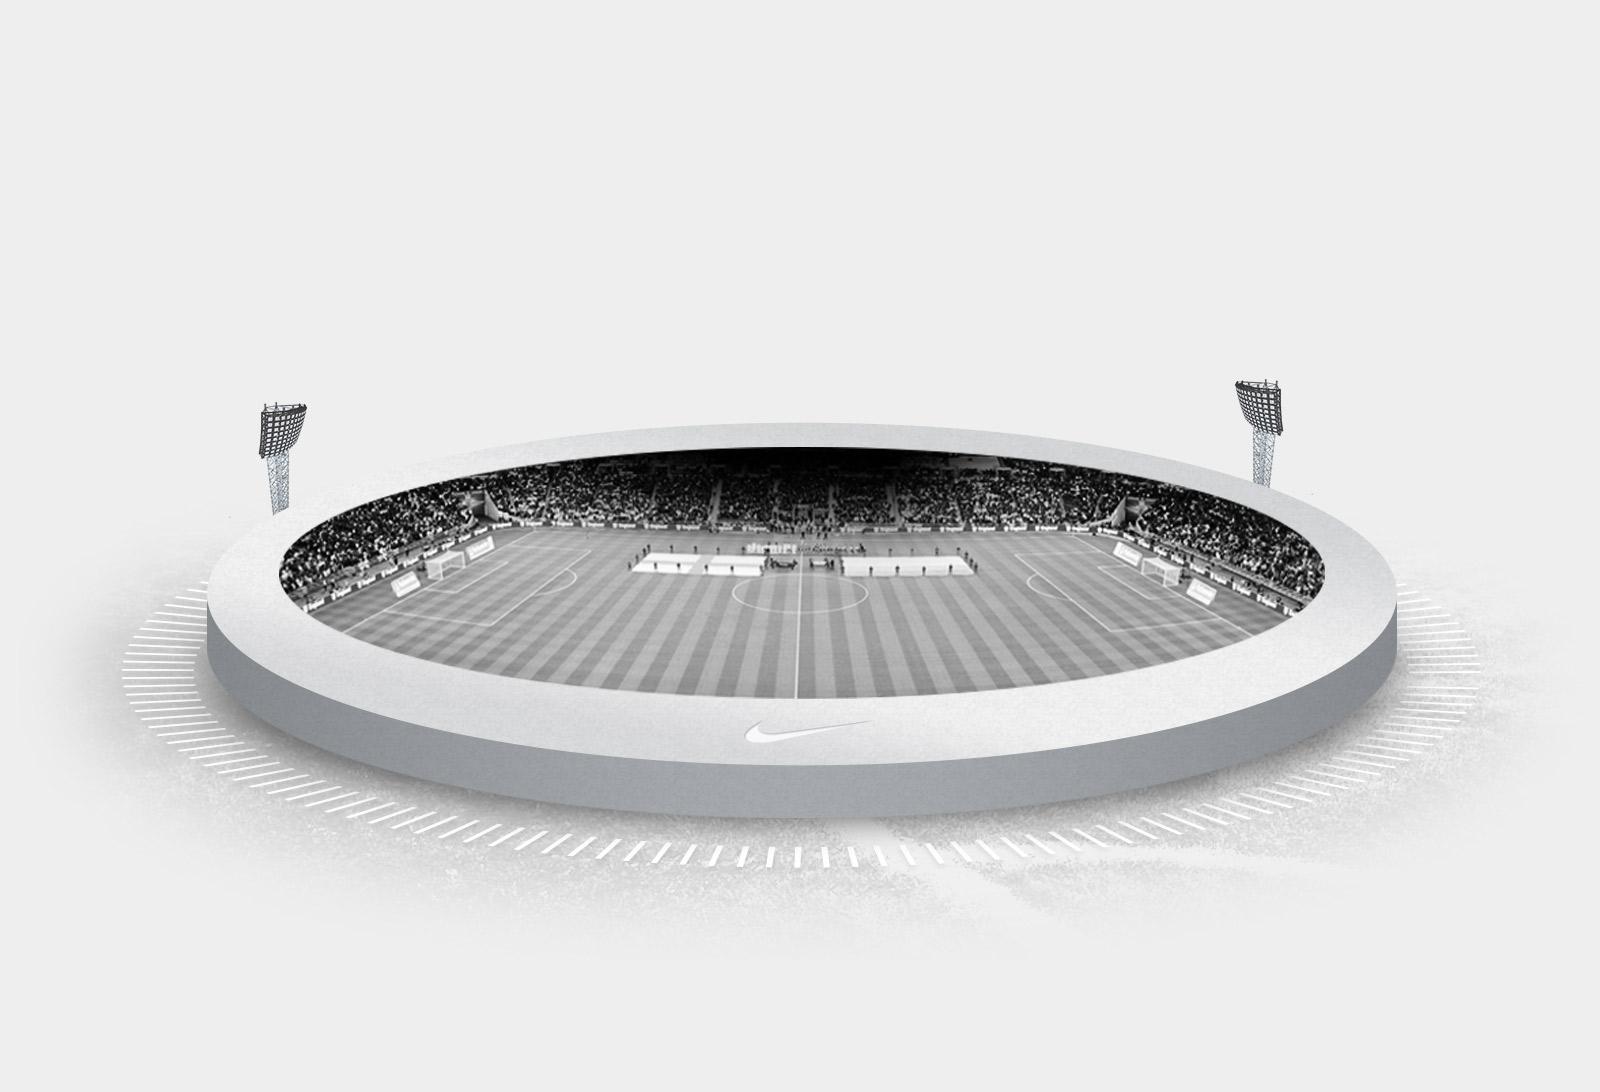 nike-stadium-4